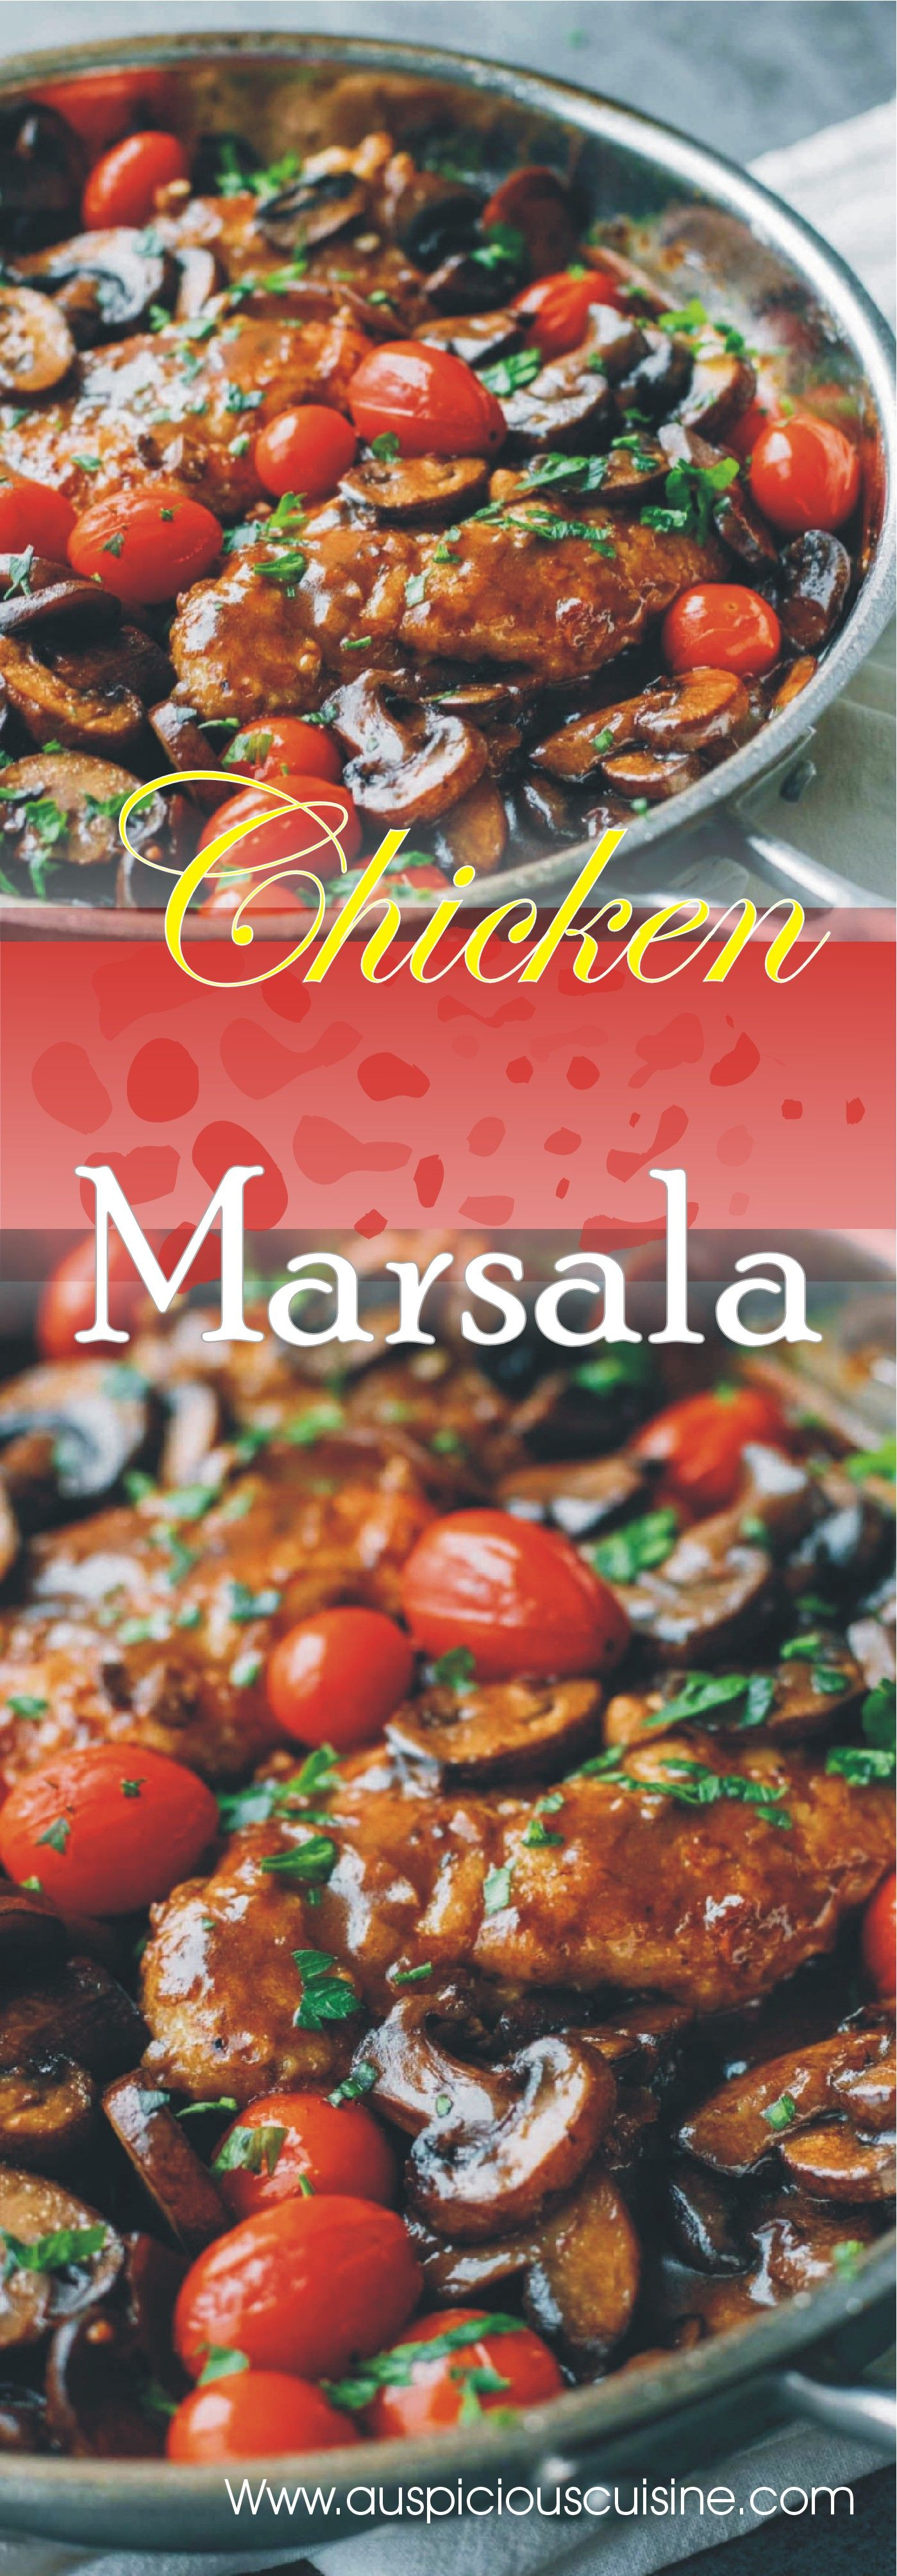 Chicken Marsala Recipe Baked Whole Chicken Recipes Food Recipes Chicken Recipes